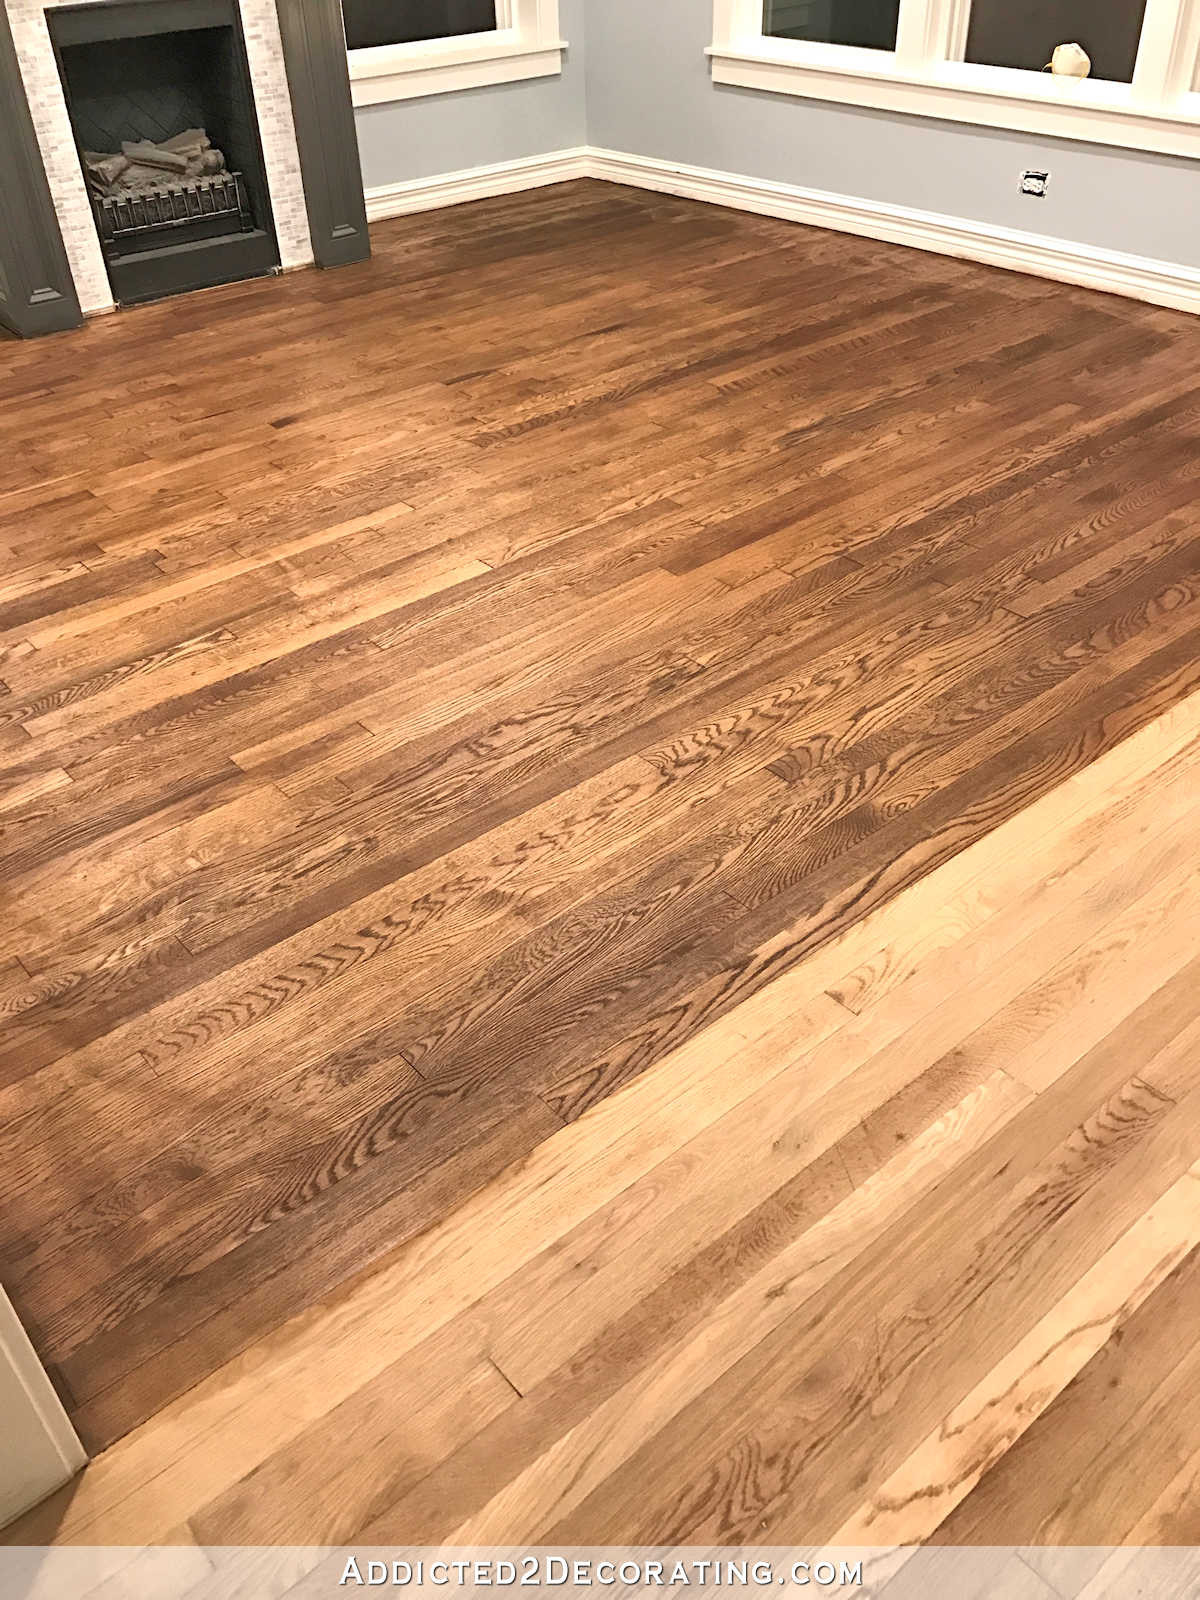 hardwood floors denver cost of adventures in staining my red oak hardwood floors products process with staining red oak hardwood floors 7 stain on the living room floor